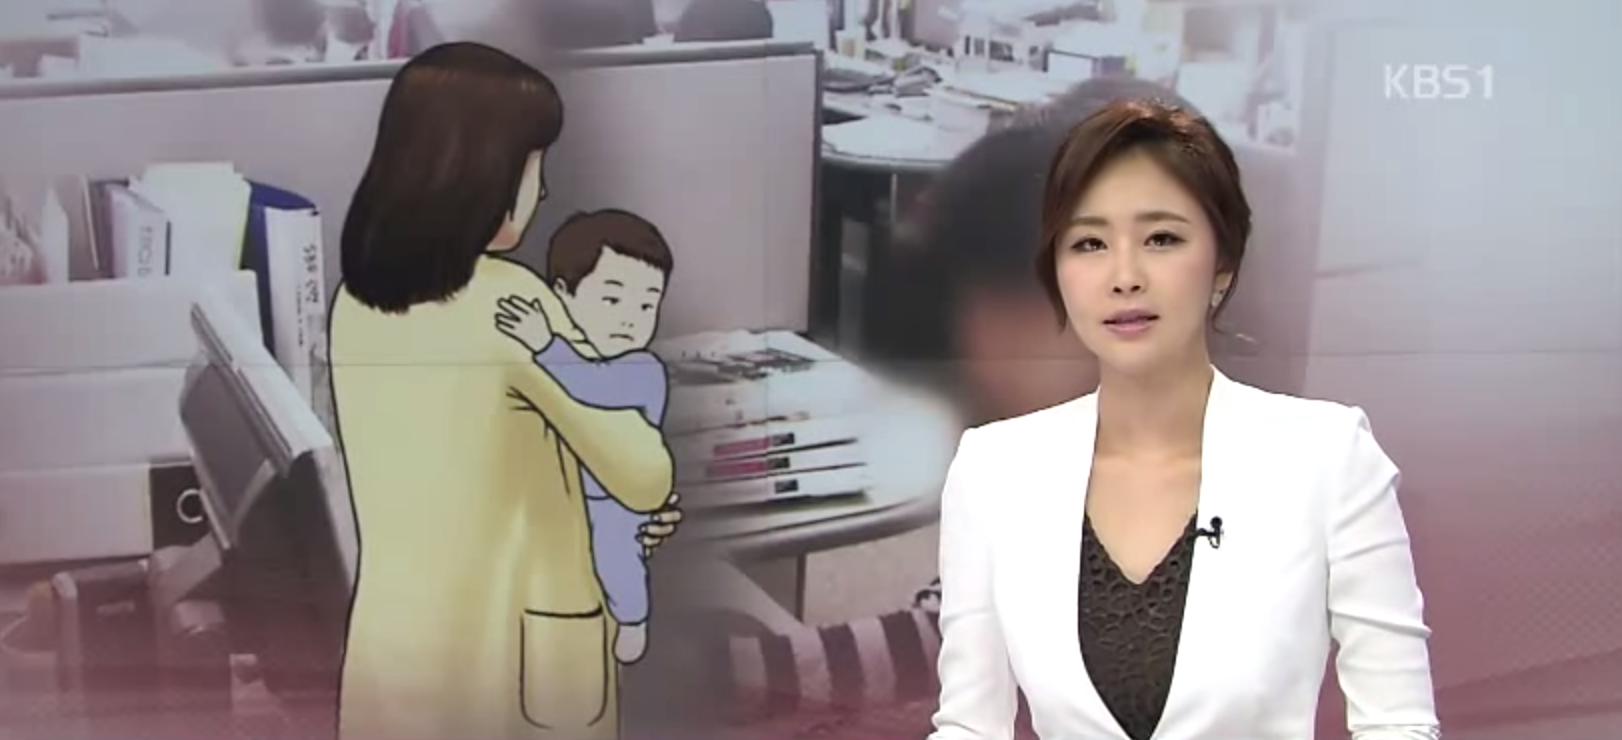 Source: KBS